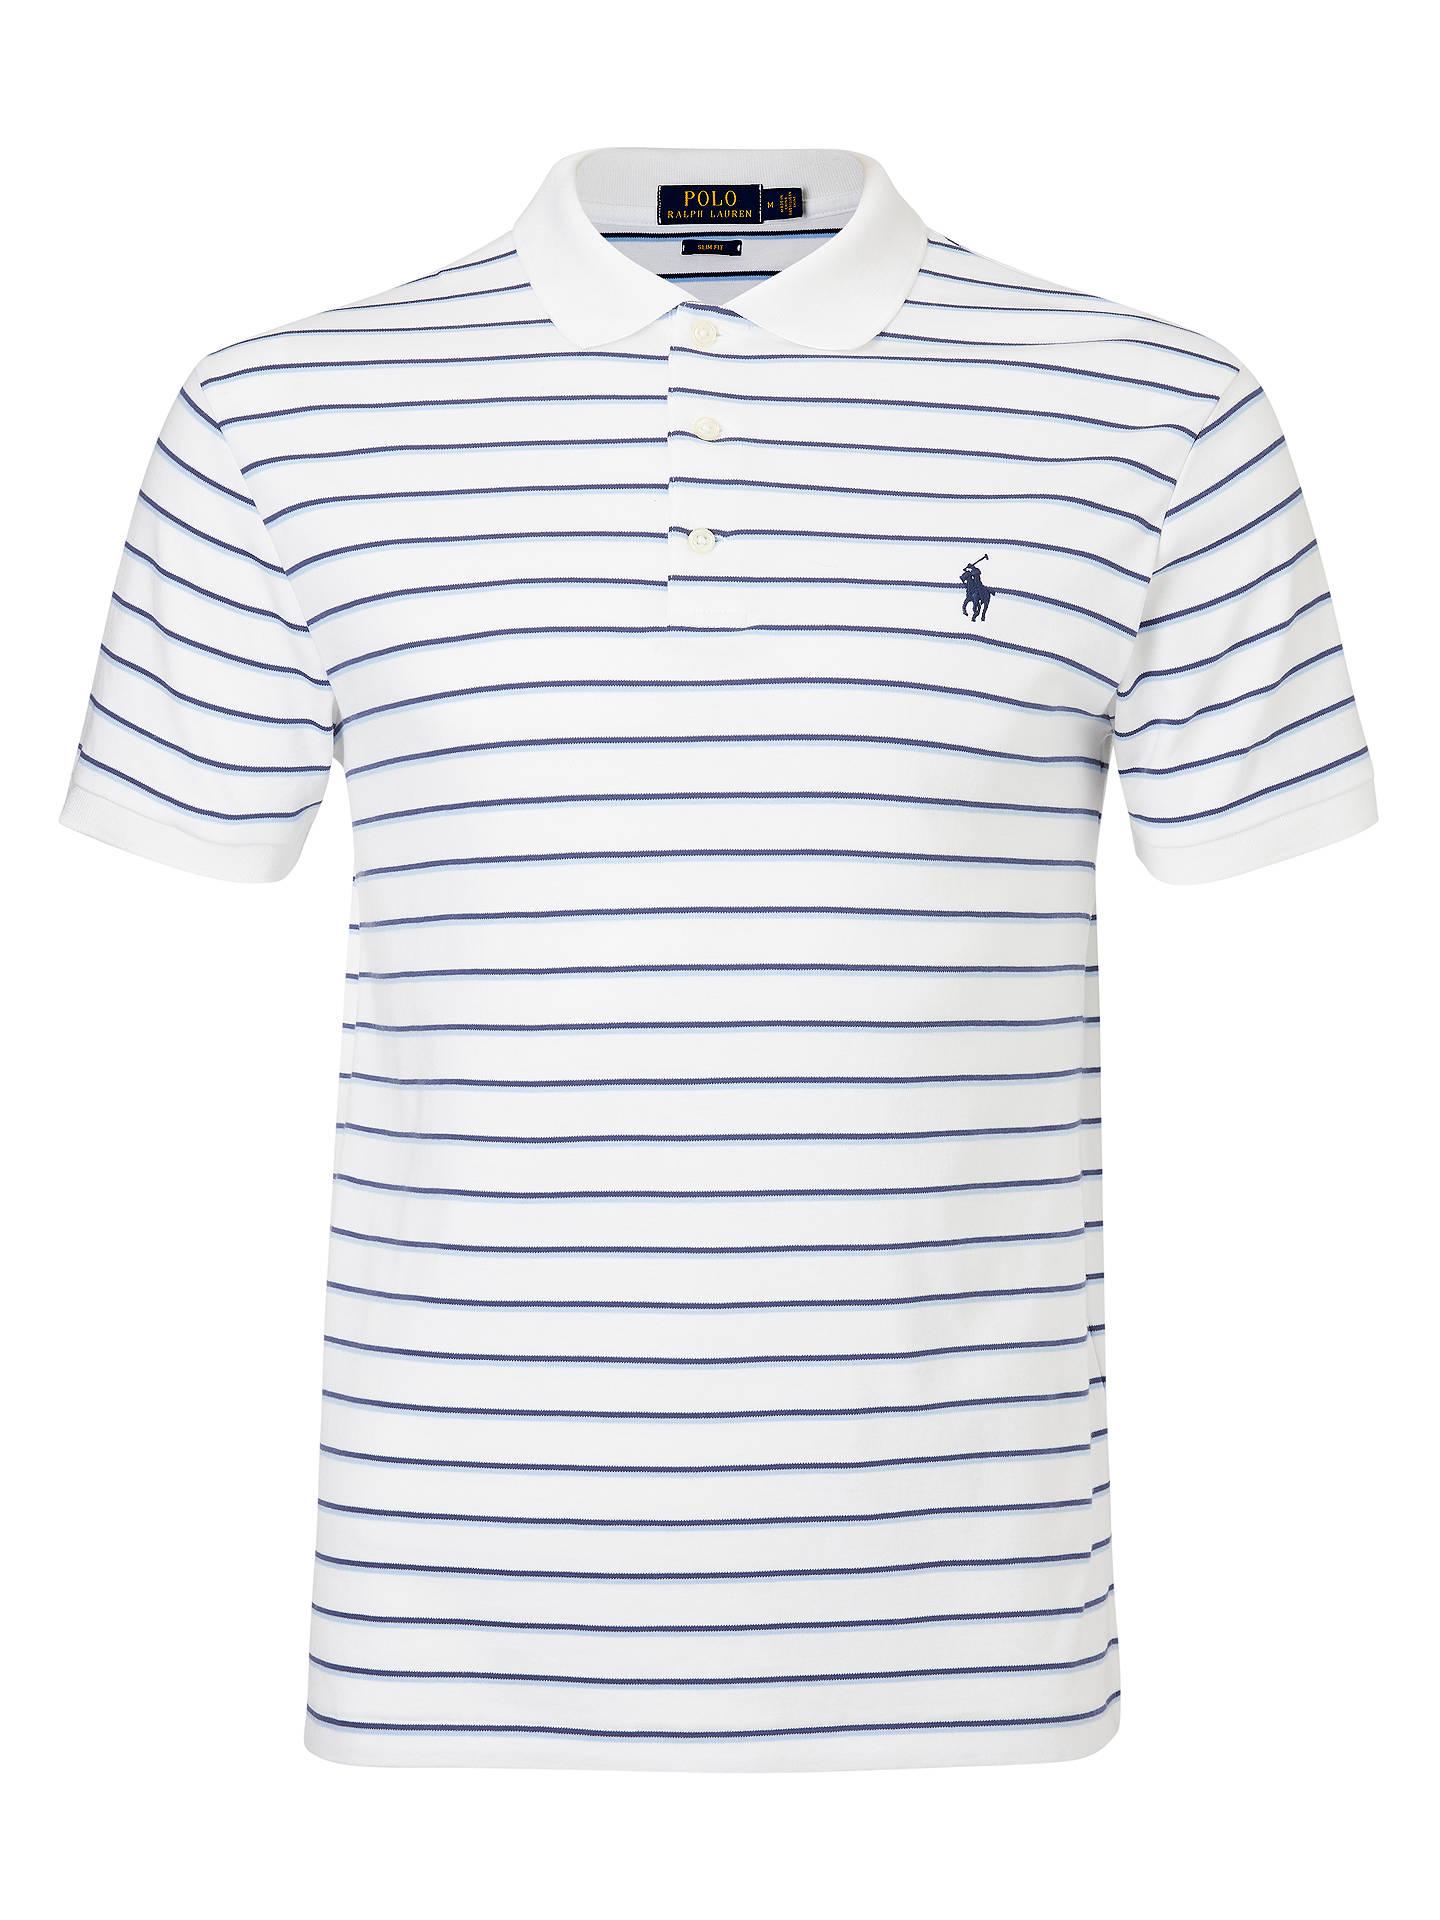 f0a4f2543620 Polo Ralph Lauren Double Stripe Polo Shirt at John Lewis   Partners